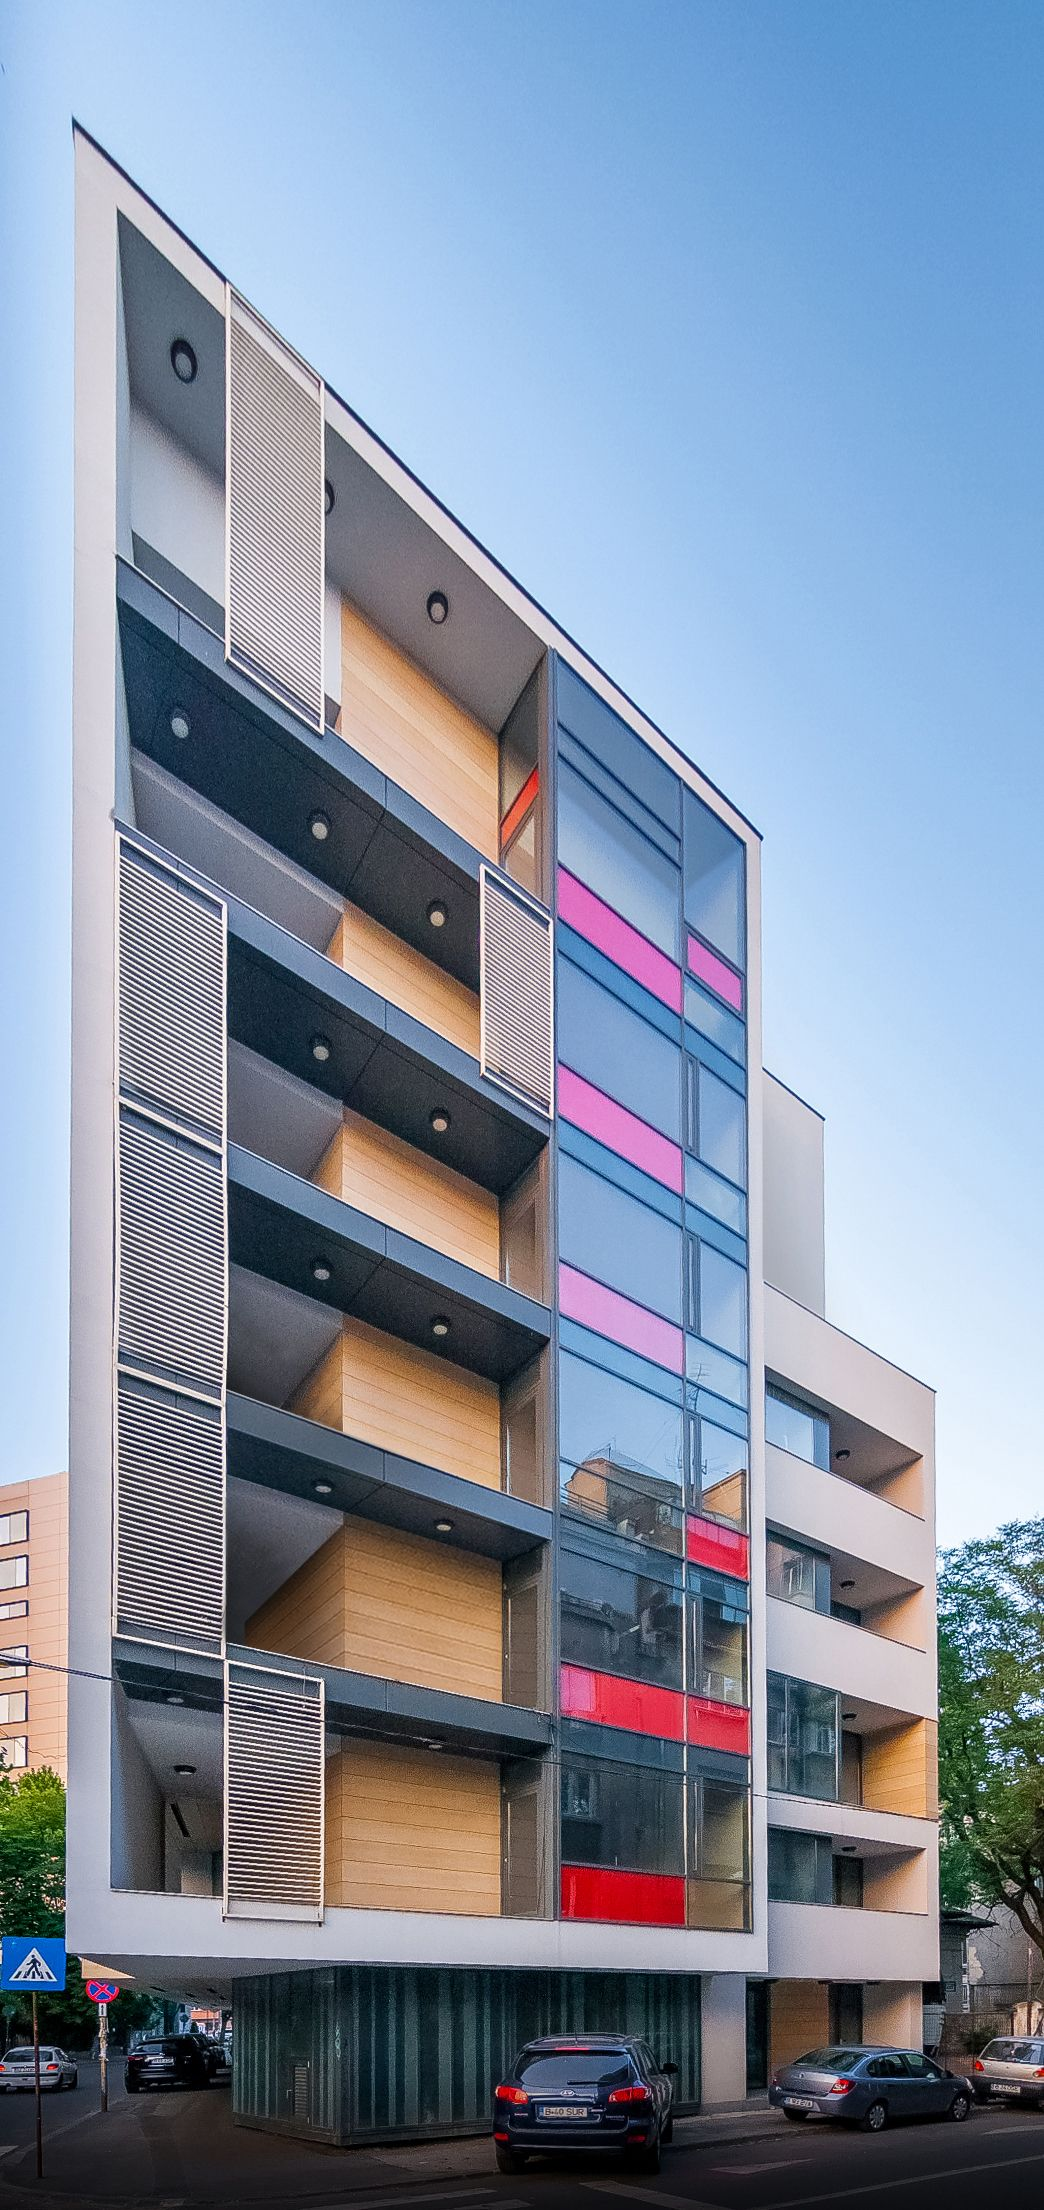 Project 7 storey office building location batistei 34str bucharest gross area